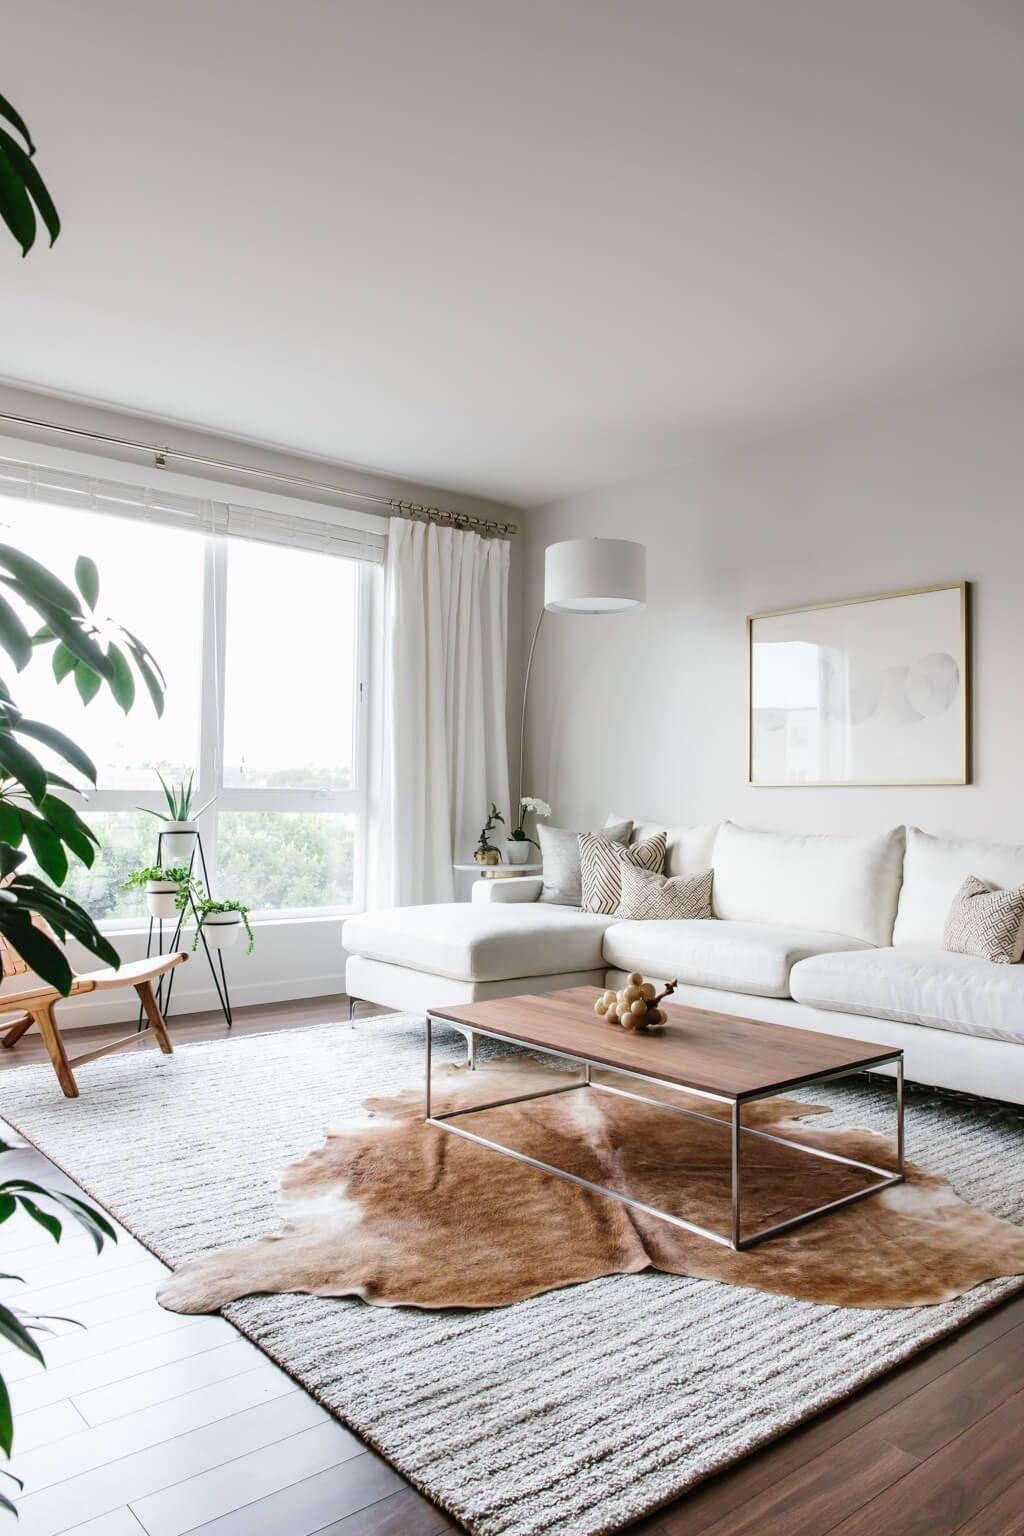 Take  tour of my modern and minimalist living room interior design style is blend minimalism mid century scandinavian socal vibes also dreamy minimal interiors gordijnen home decor rh pinterest